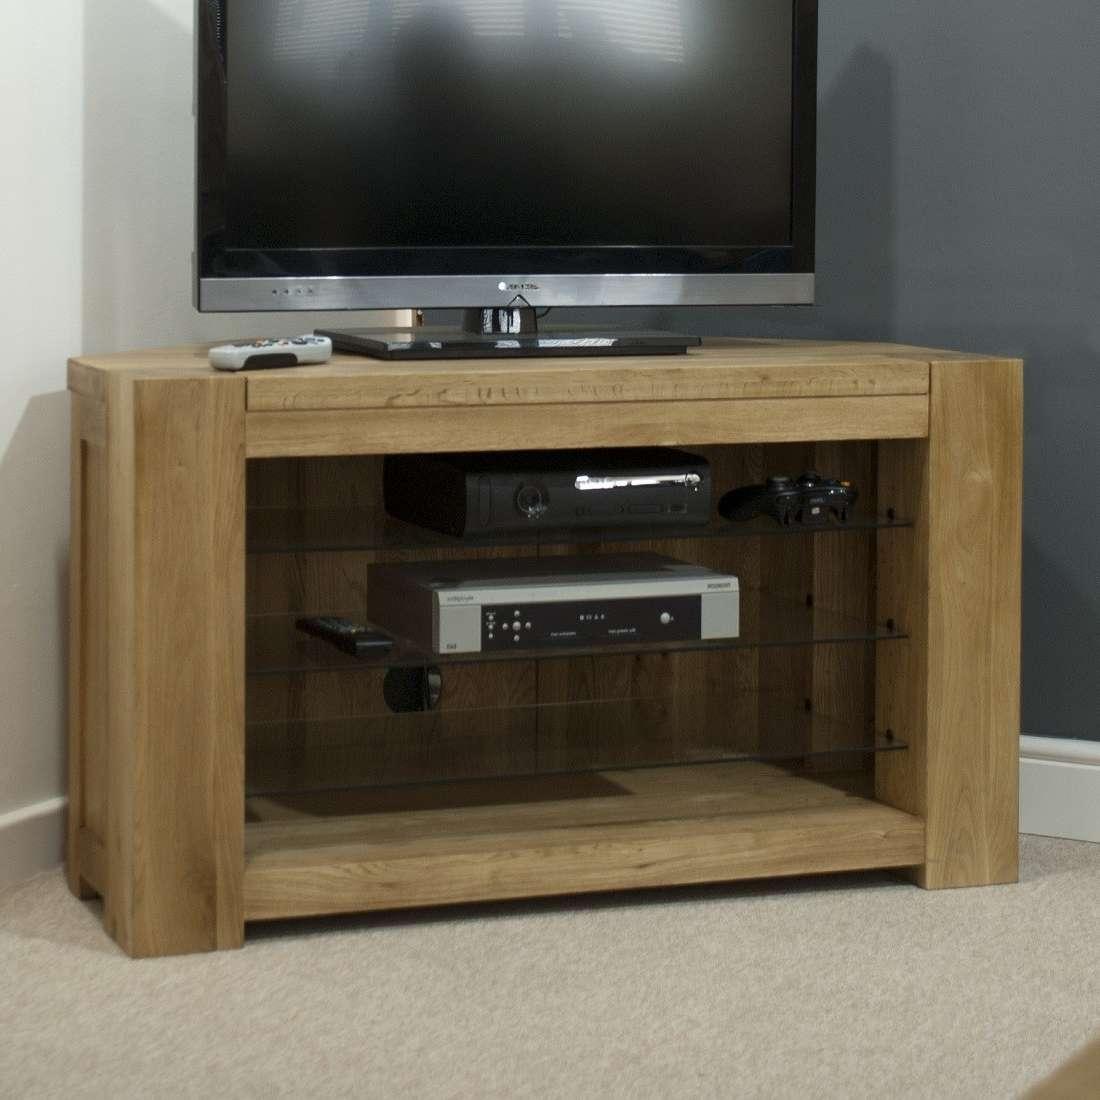 Trend Solid Oak Corner Tv Unit | Oak Furniture Uk Pertaining To Corner Oak Tv Stands For Flat Screen (View 10 of 15)